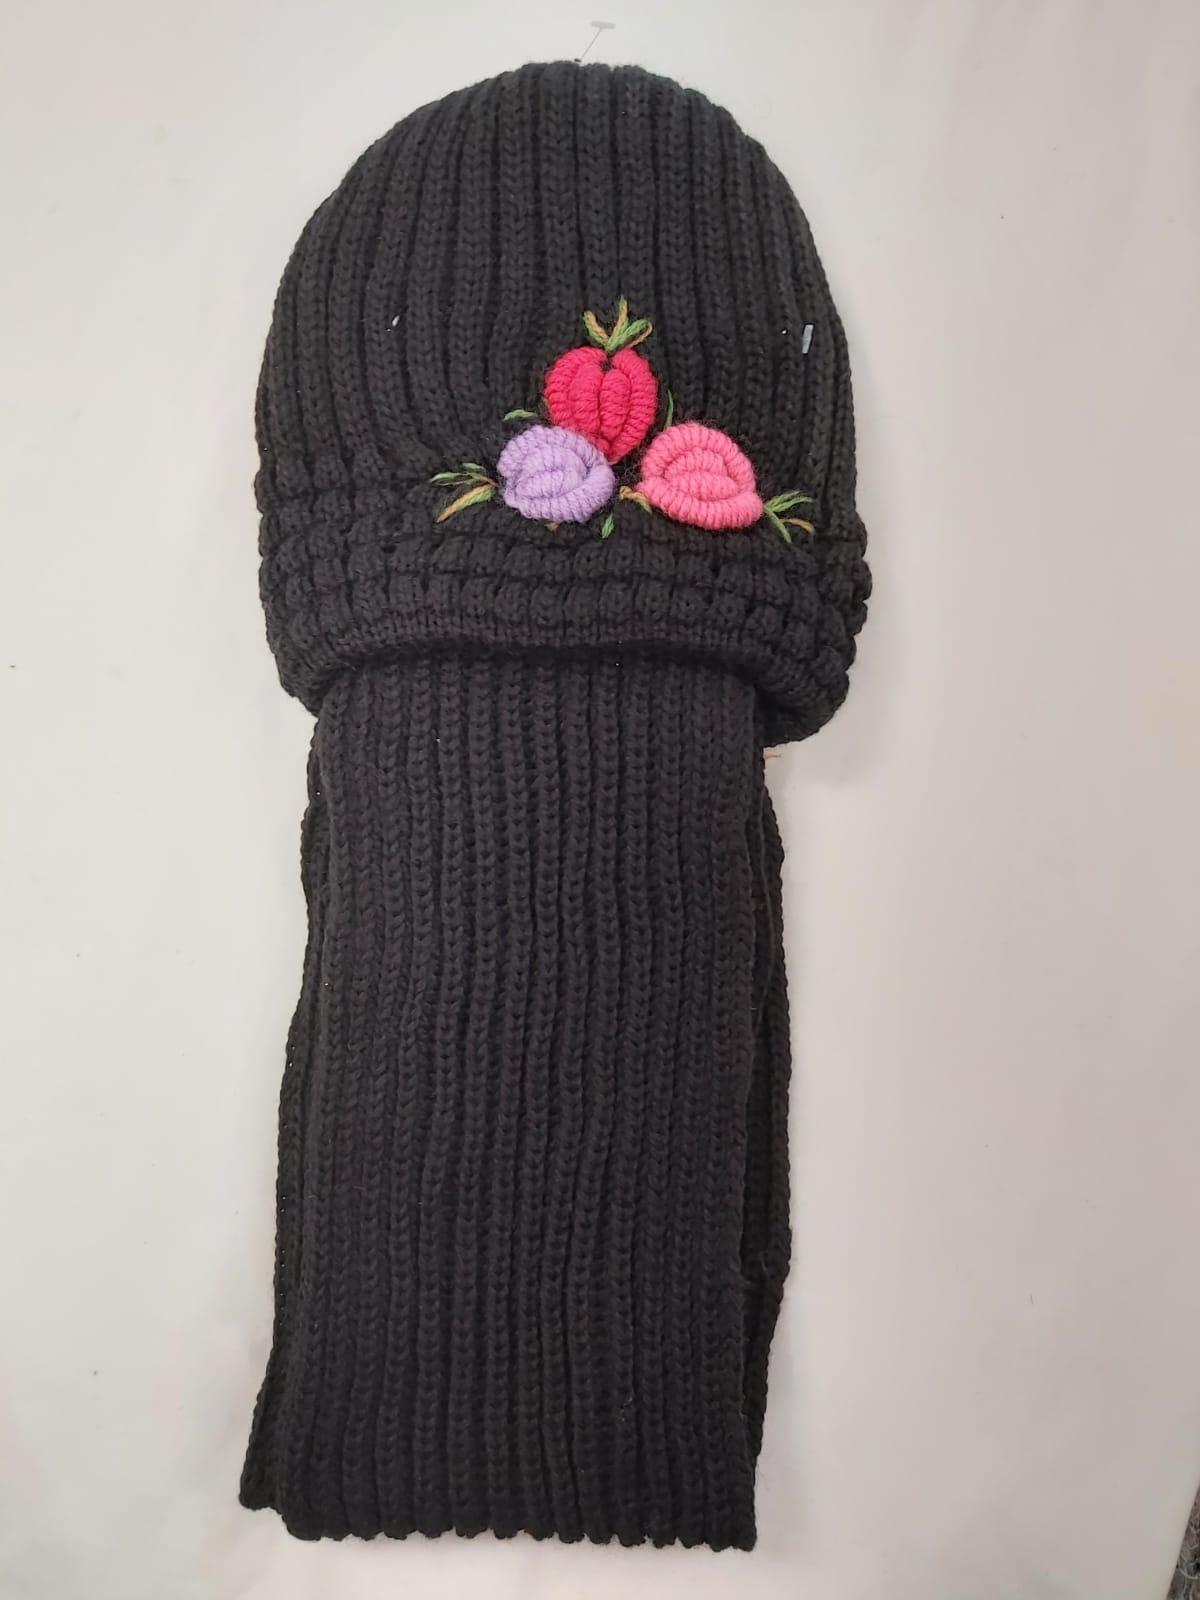 LADIES HAT AND SCARF SET WINTER WARM X12